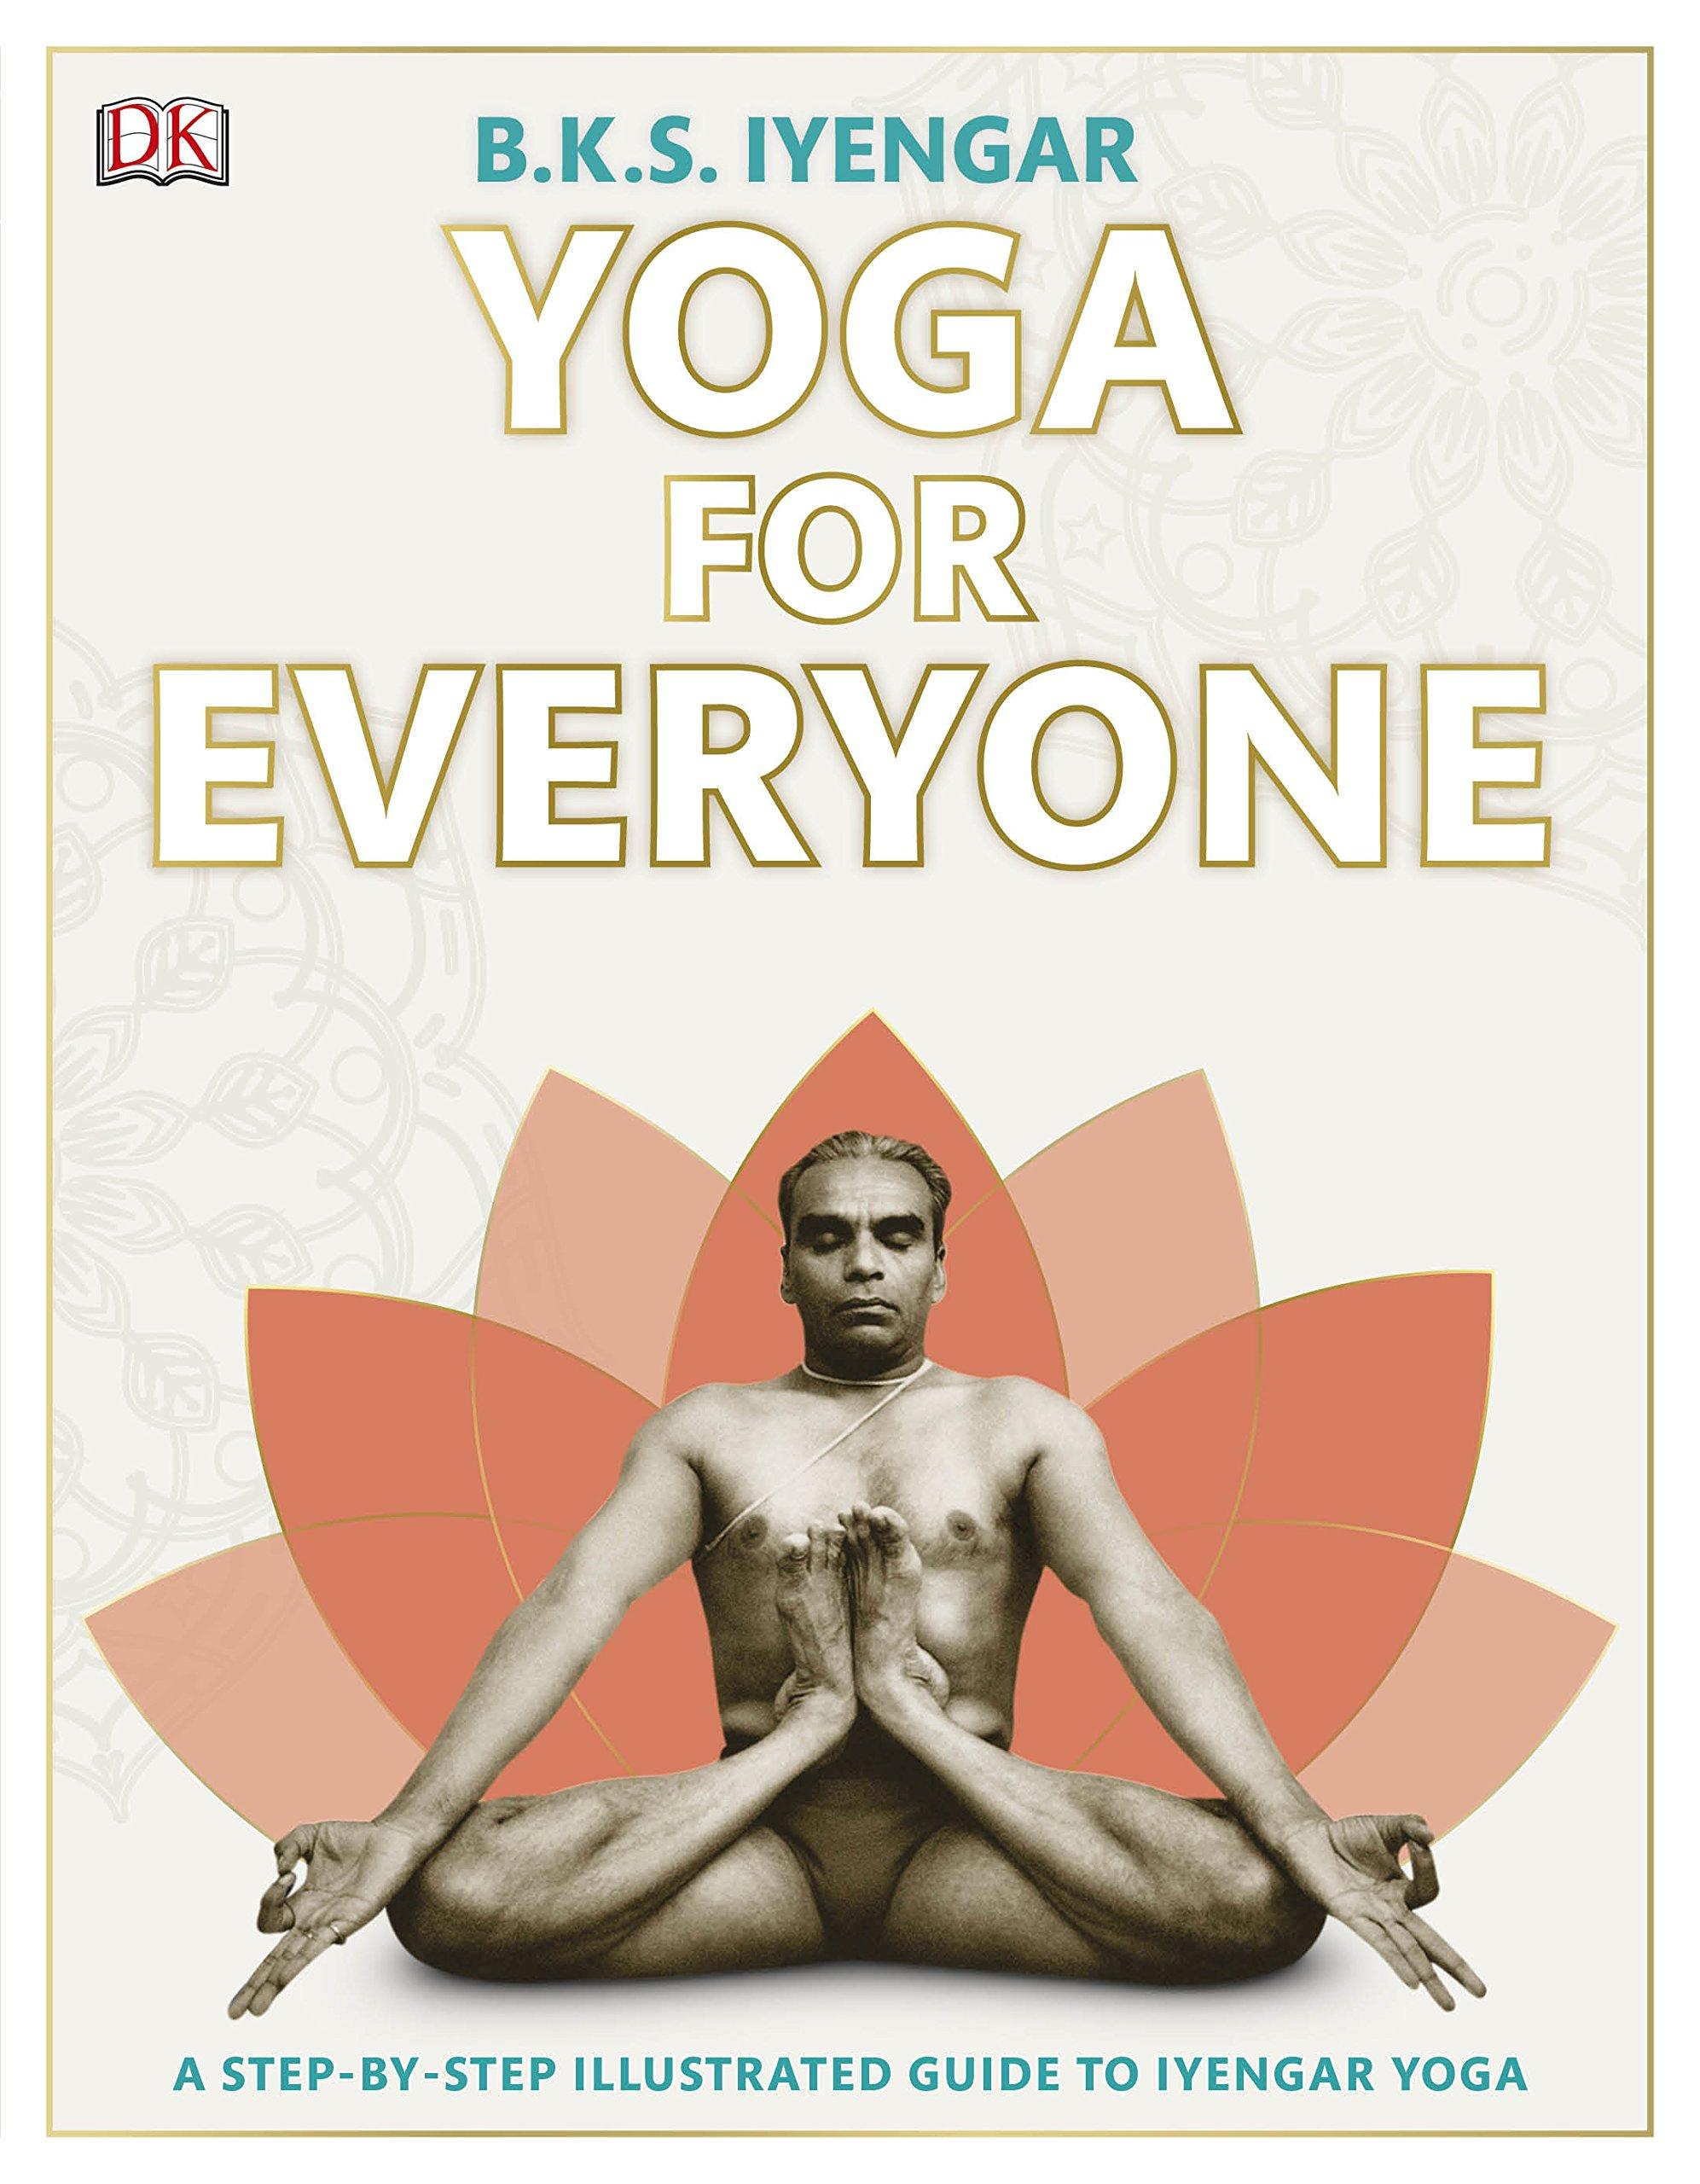 Yoga For Everyone B K S Iyengar Dk 9780241356784 Amazon Com Books